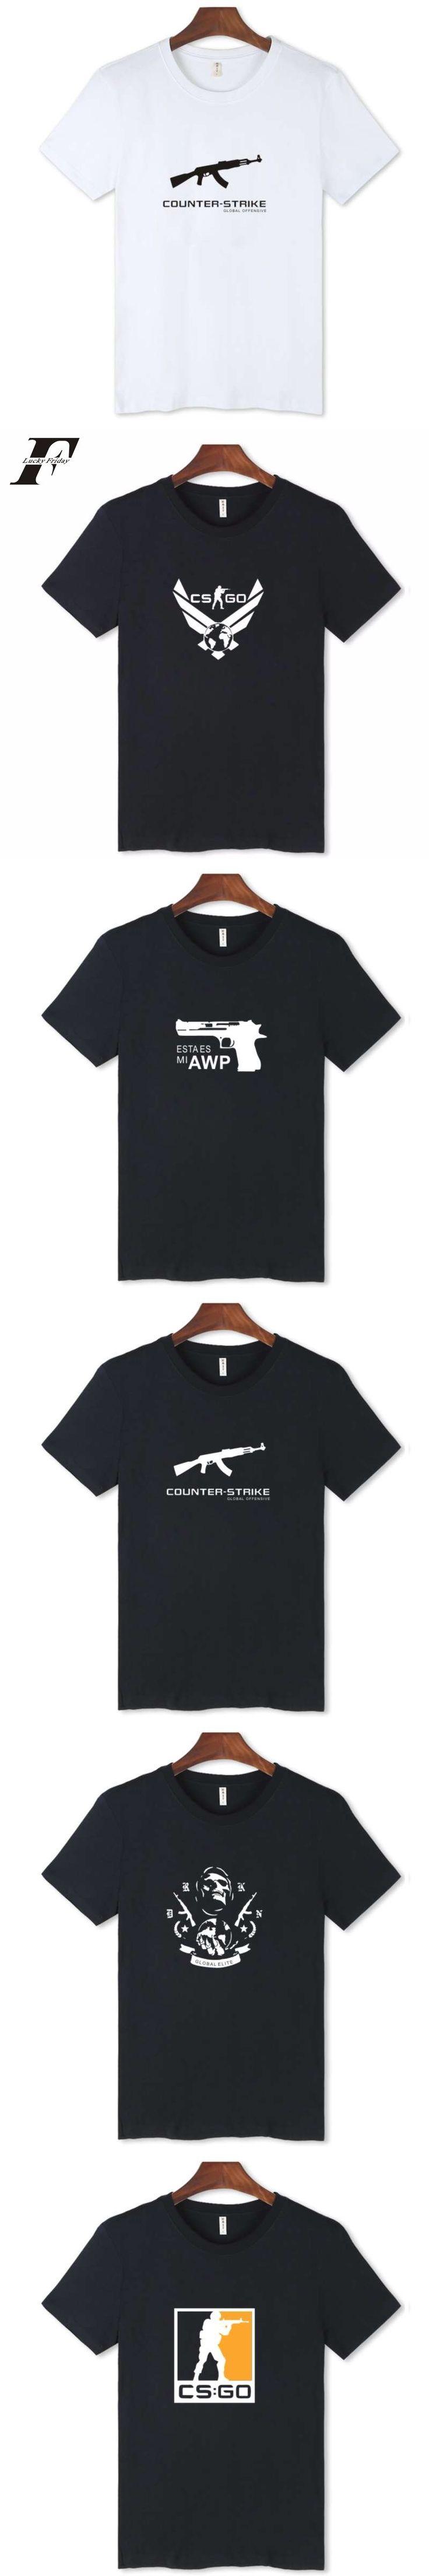 LUCKYFRIDAY CSGO Trendy Black Short Sleeve cs go T Shirt Funny T-shirts Men tshirt Streetwear Mens  Cotton t shirts Tees tops